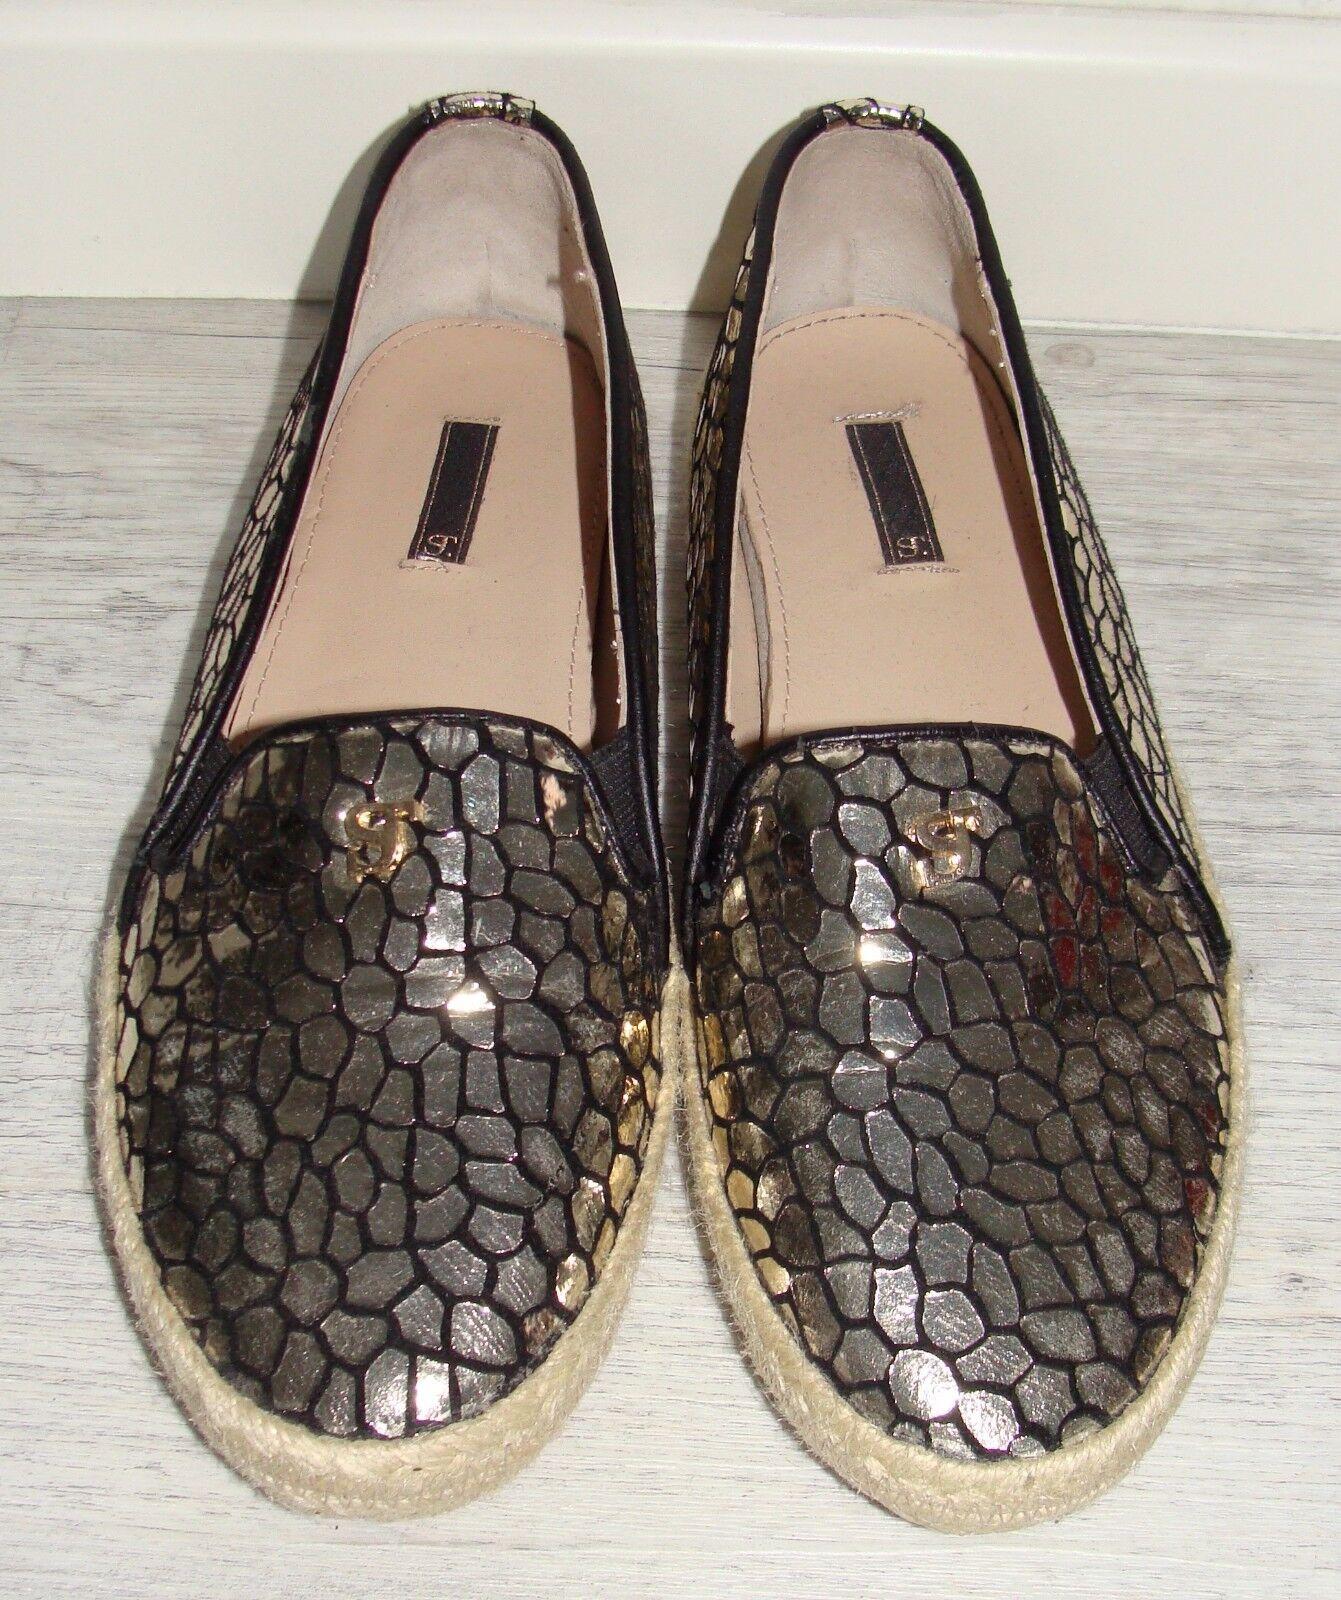 STUDIO Schuhe gold Größe 38 Espandrilles schwarz gold Schuhe Trend m&h top Blogger edel 478862